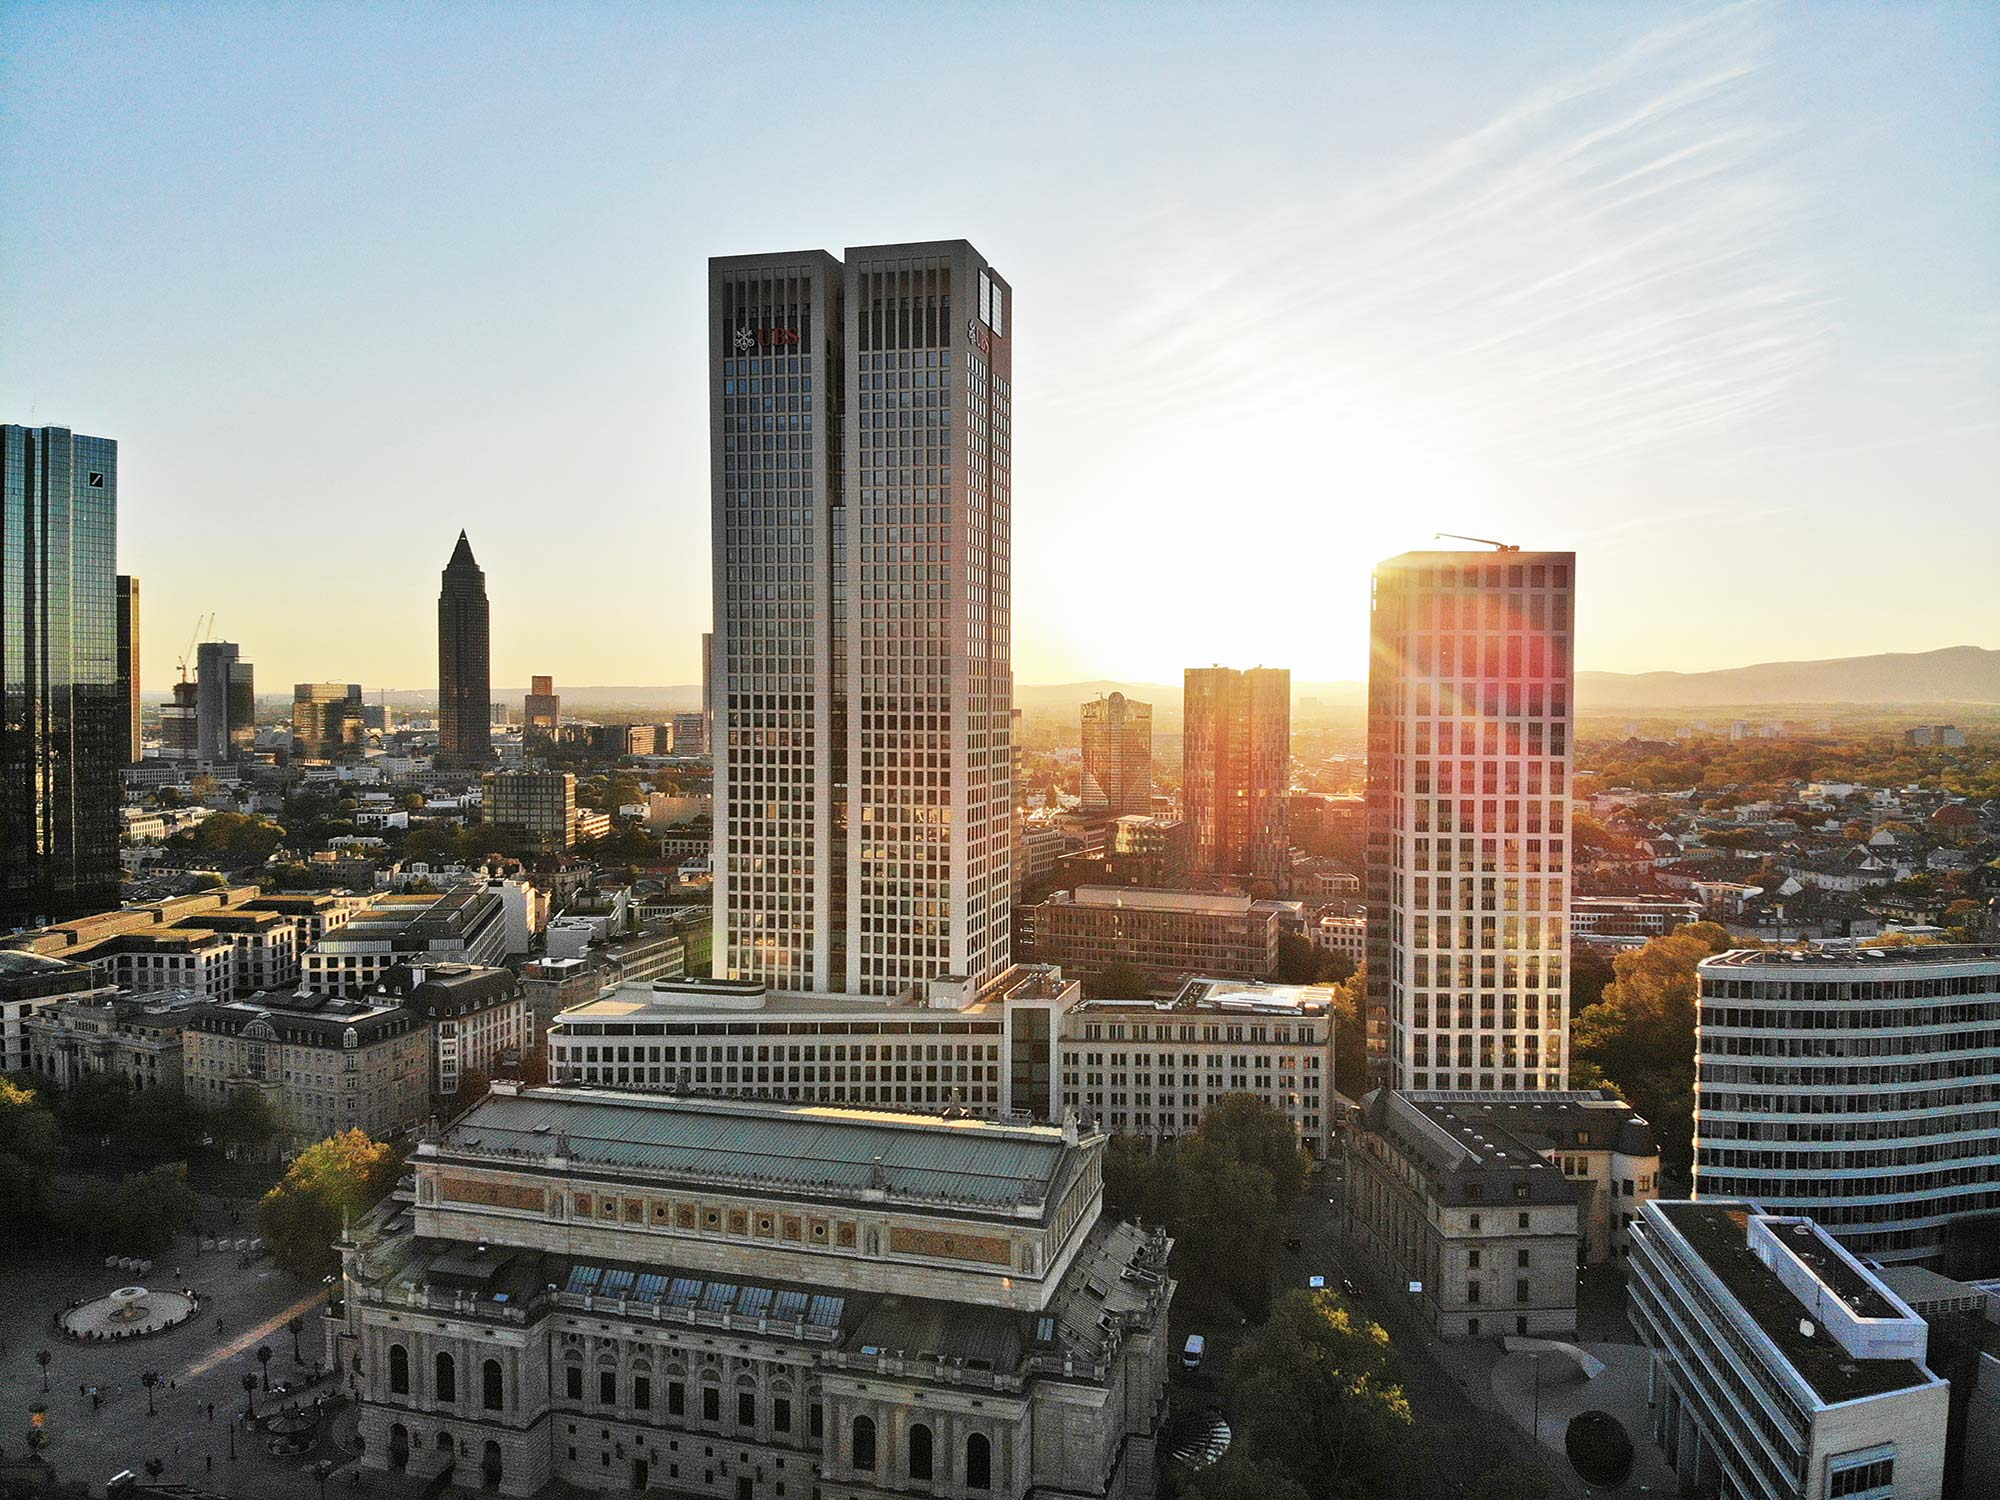 OpernTurm Frankfurt - Opern Turm Luftaufnahme - Drohnenaufnahme Alte Oper - Luftaufnahme Westend - Panorama Frankfurt am Main